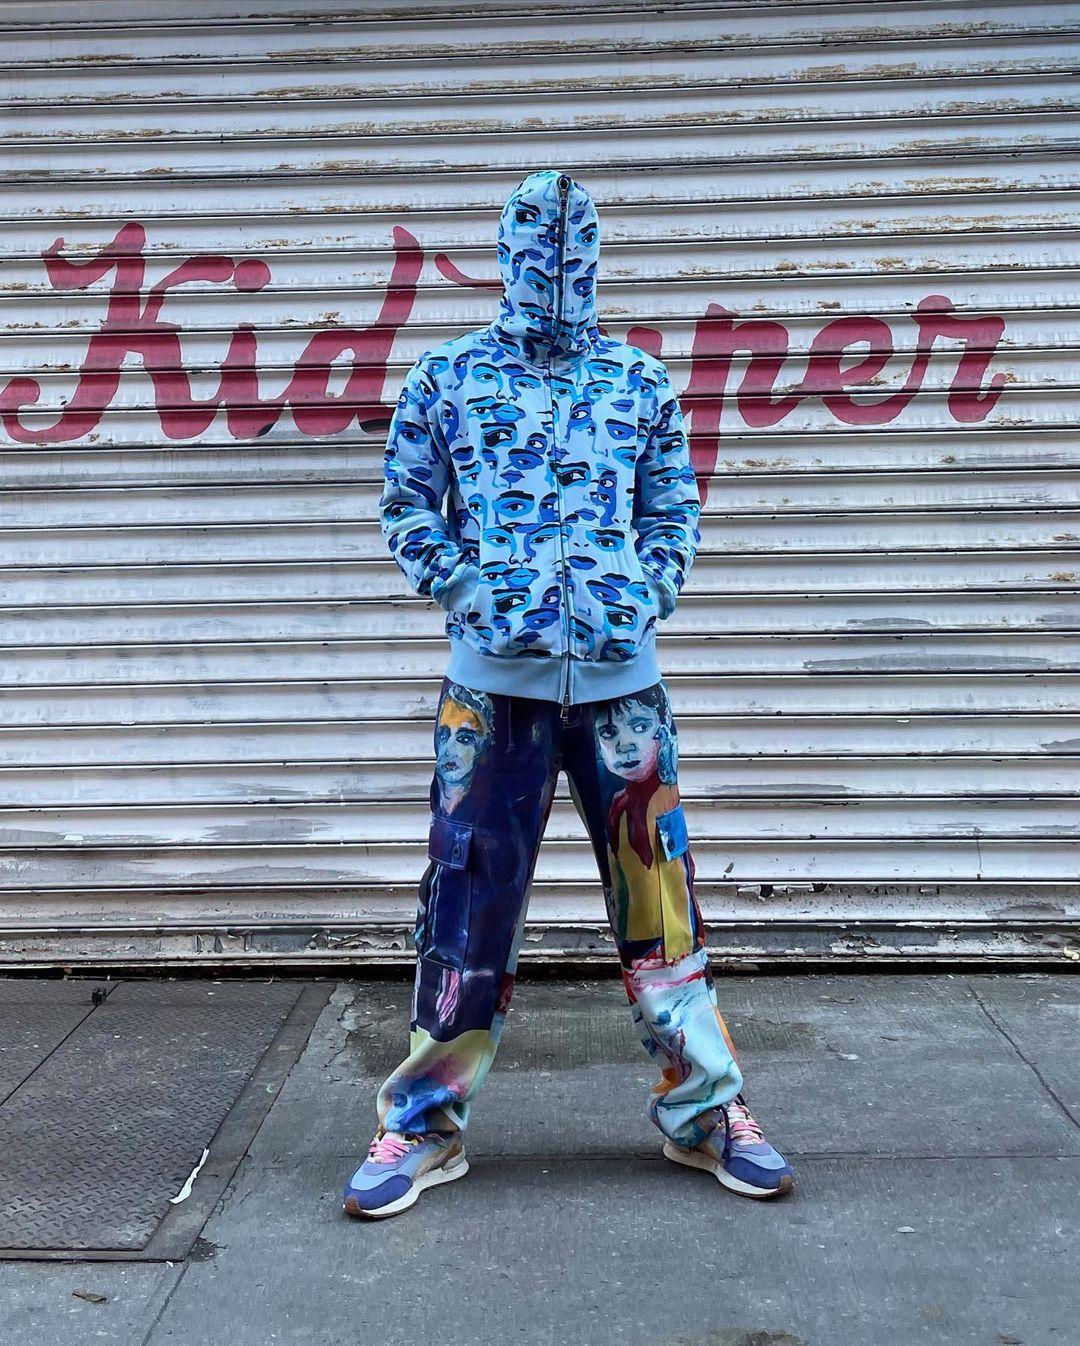 PUMAMirage Mox KidSuper / 357189-01 /blue on feet